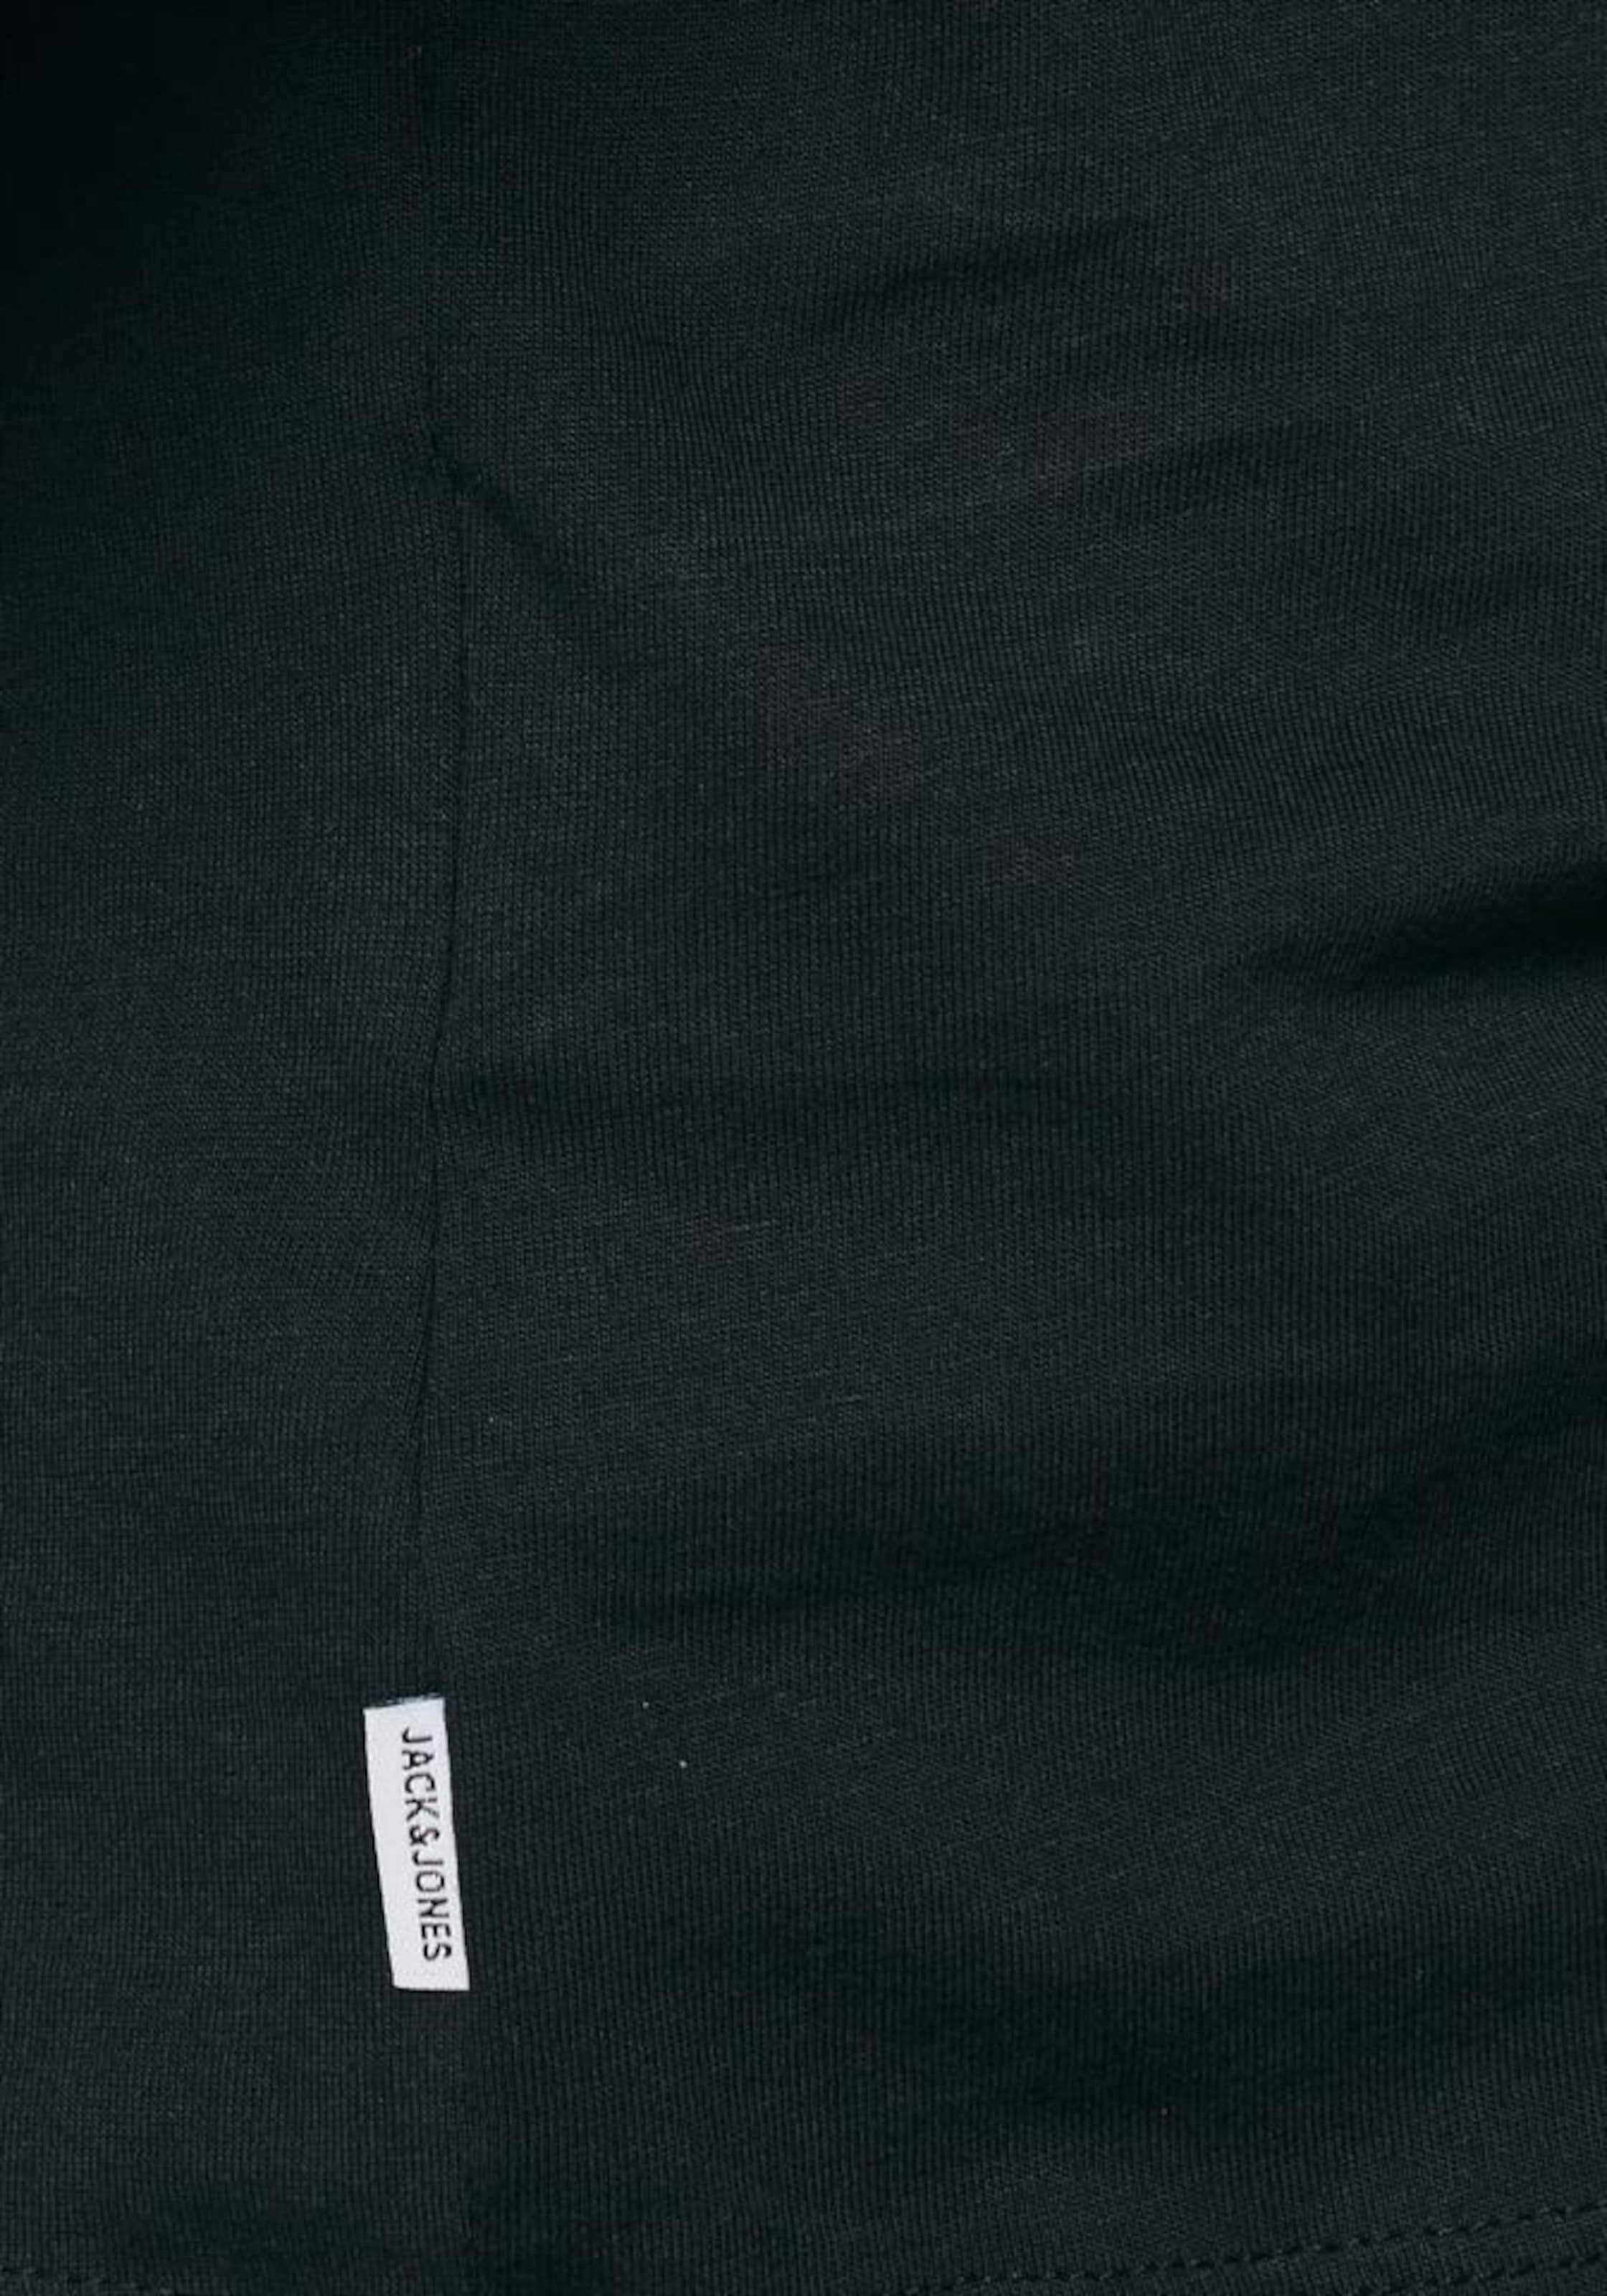 Basic In Jackamp; shirt 'organic Tee' T Schwarz Jones 9IDWEY2H